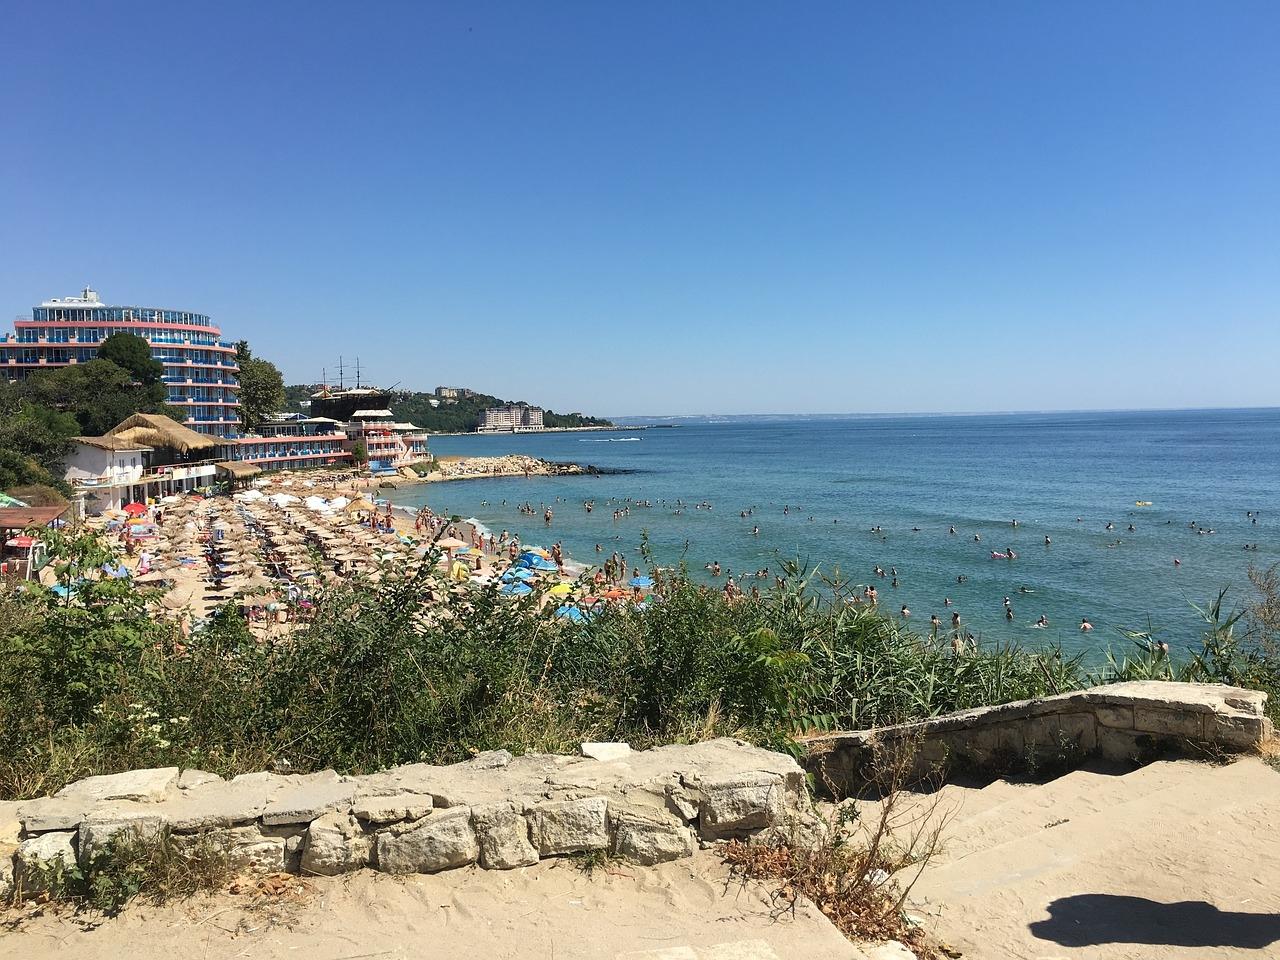 9fafeb52dea2 Sightseeing on Bulgaria s Black Sea Coast by Enjoy Plovdiv (Code ...